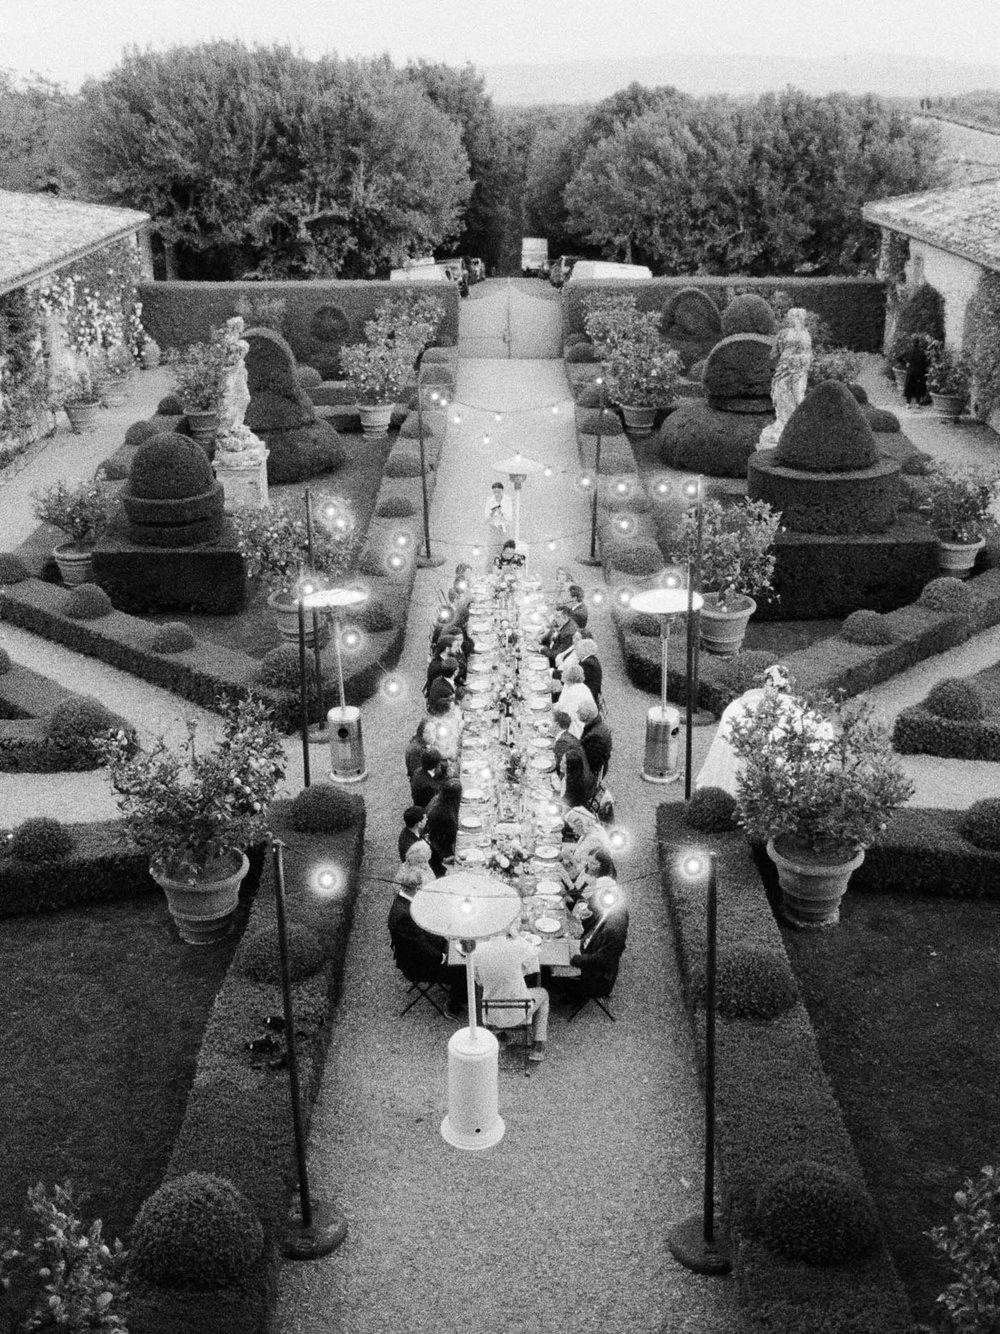 Villa_Cetinale_Wedding-56-Jen_Huang-ElanJacob-344-Jen_Huang-000058470024.jpg